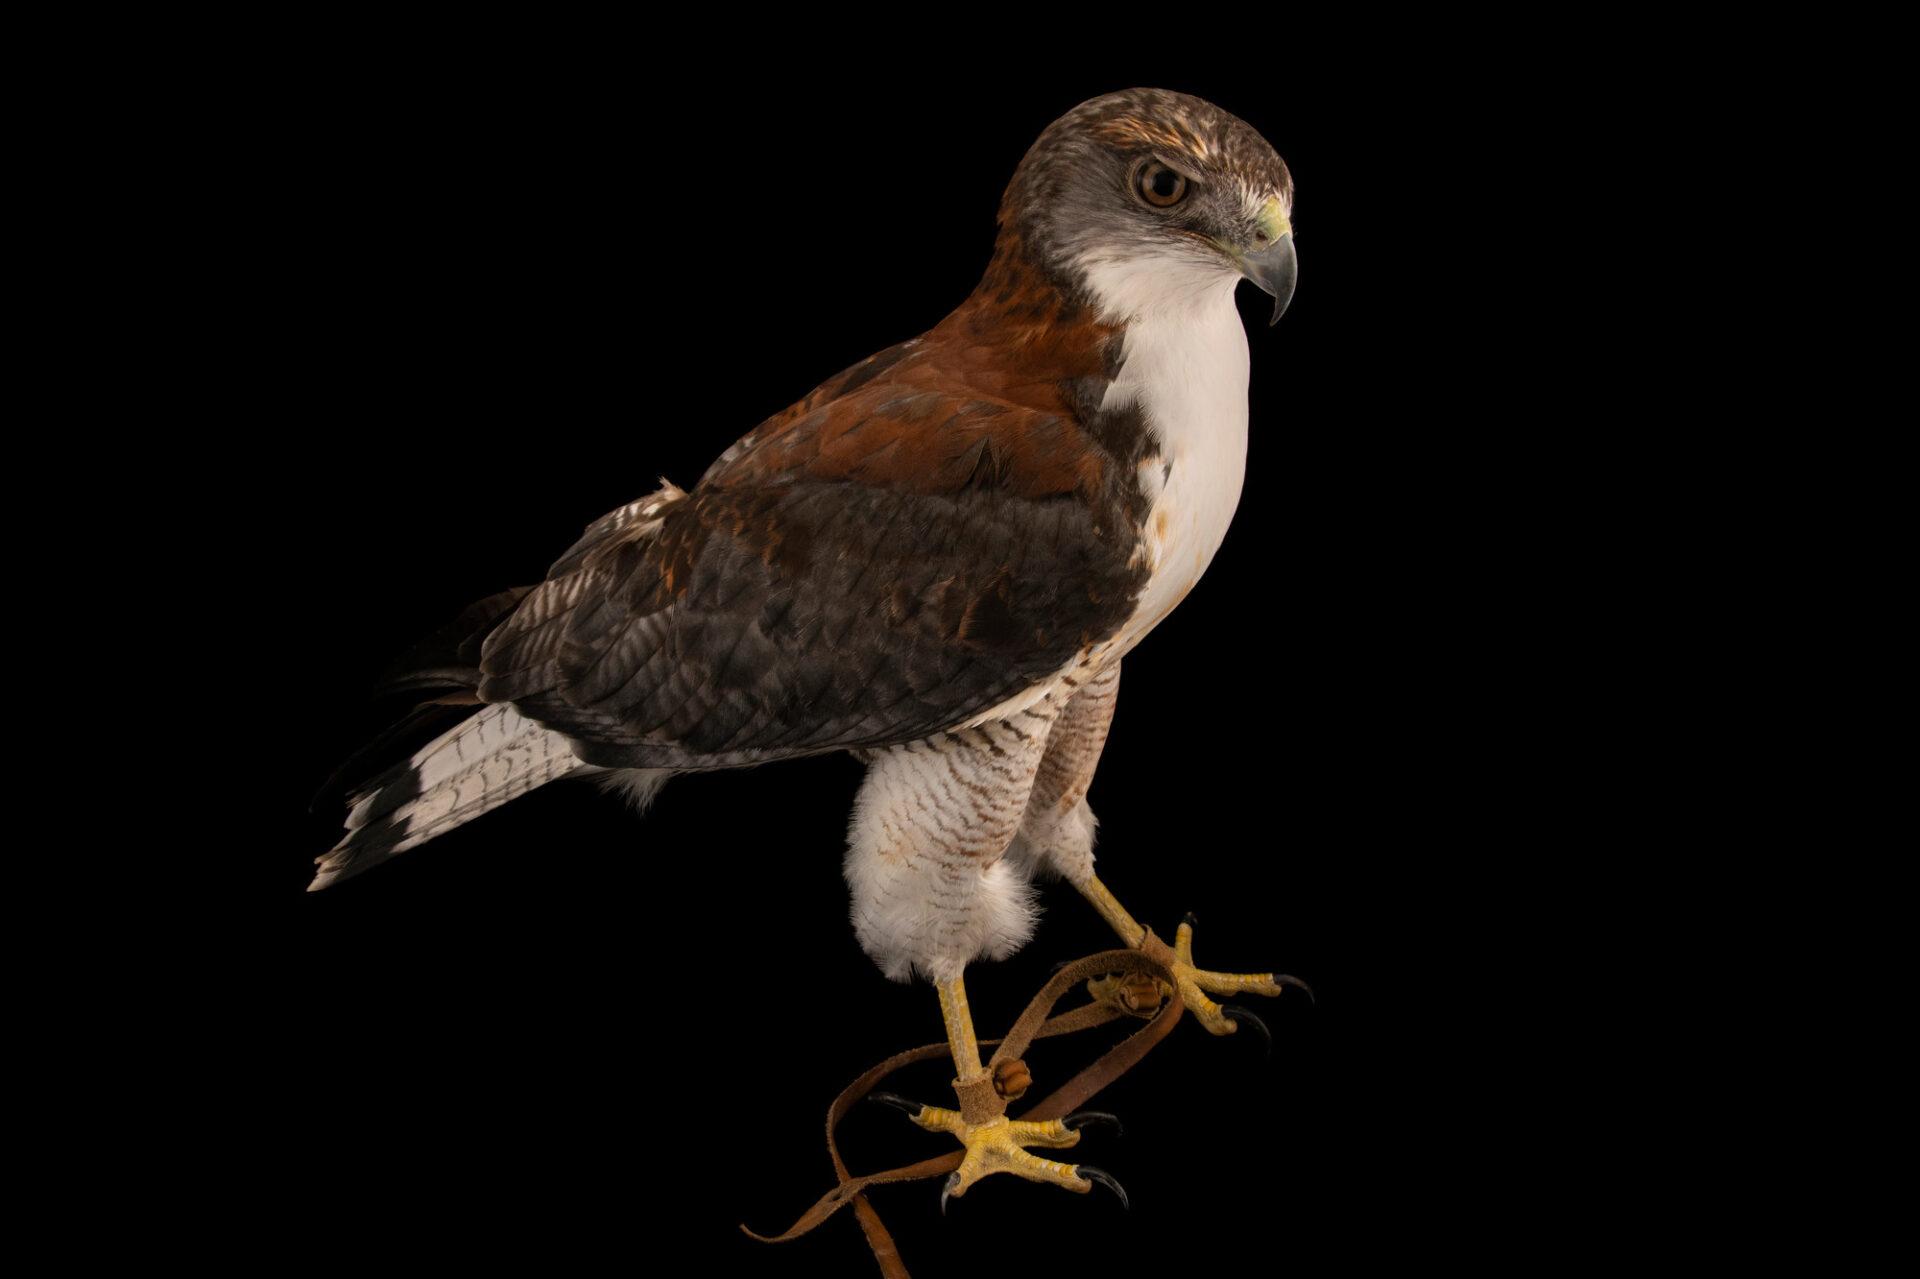 Photo: A variable hawk (Geranoaetus polyosoma polyosoma) at the Santiago Zoo in Chile.